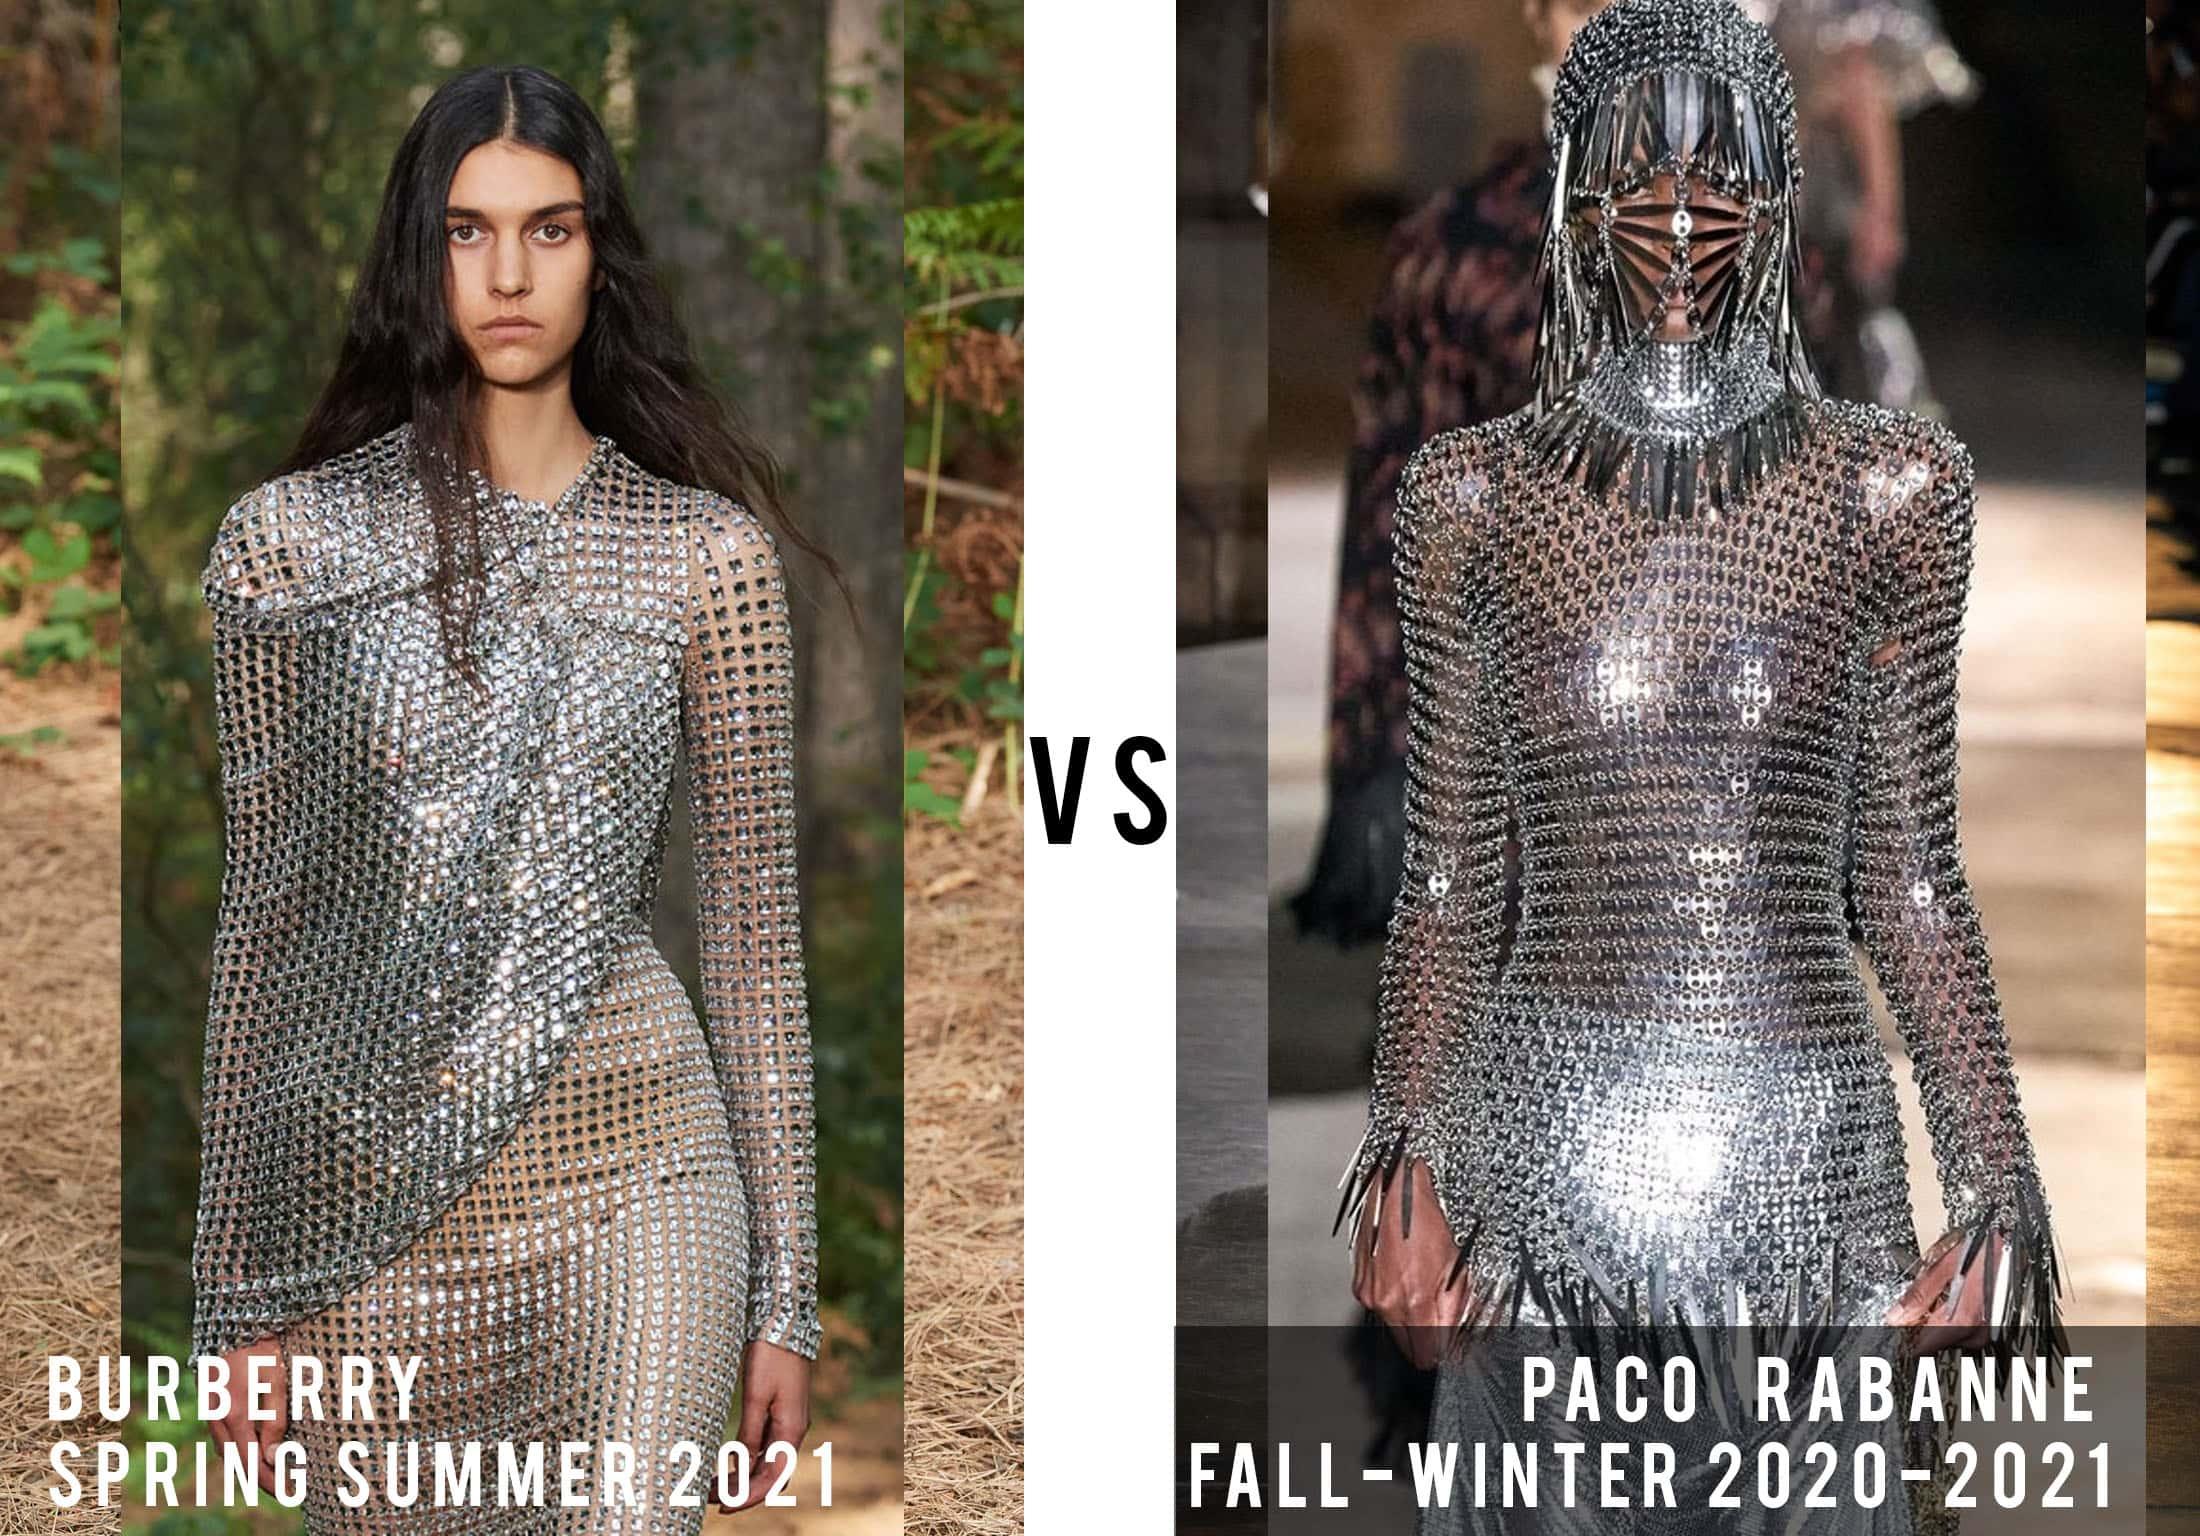 Burberry Spring Summer 2021 vs Paco Rabanne Fall-Winter 2020-2021